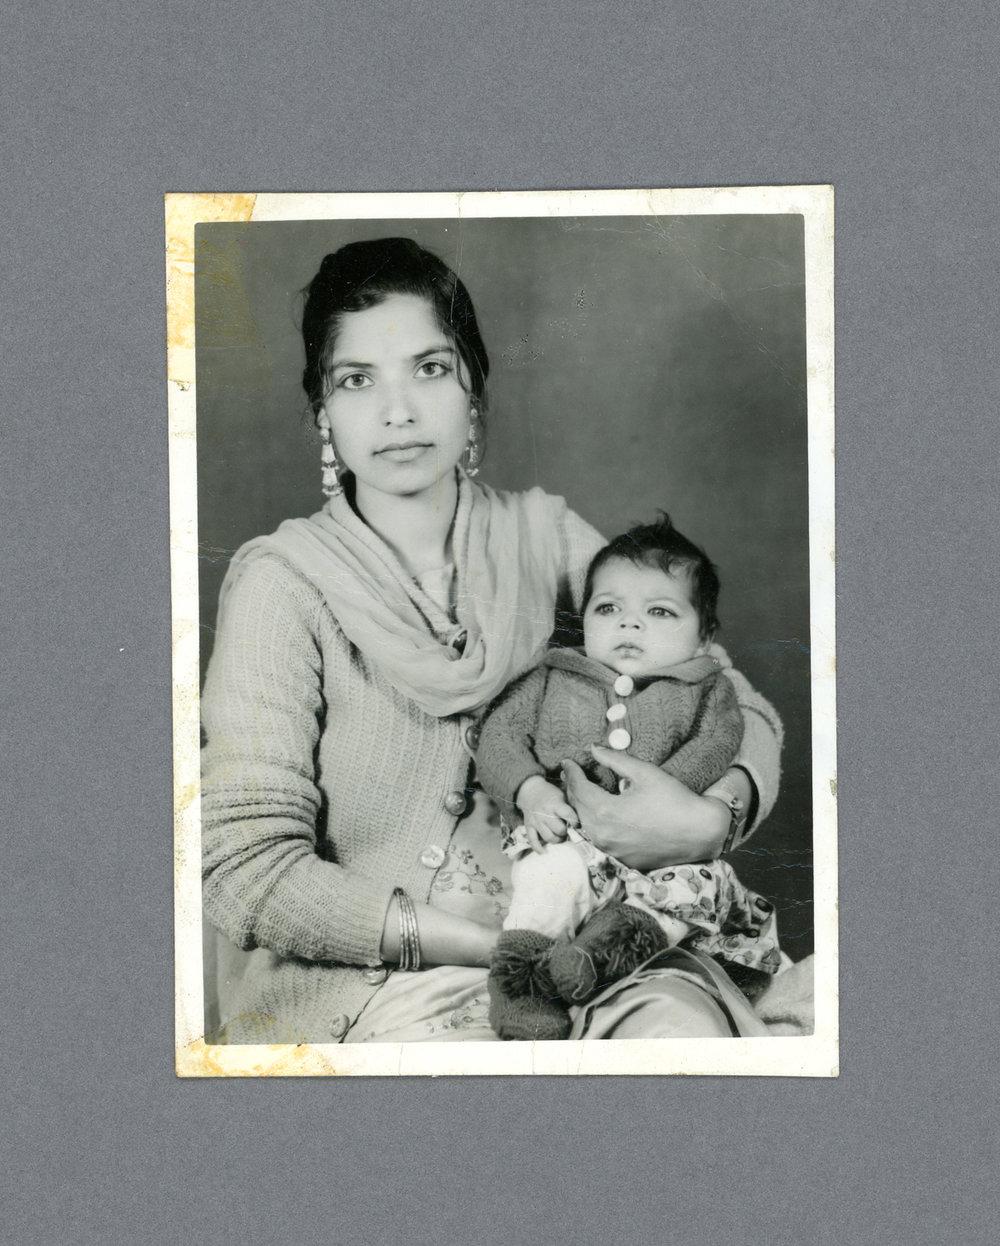 Punjab, India c.1969